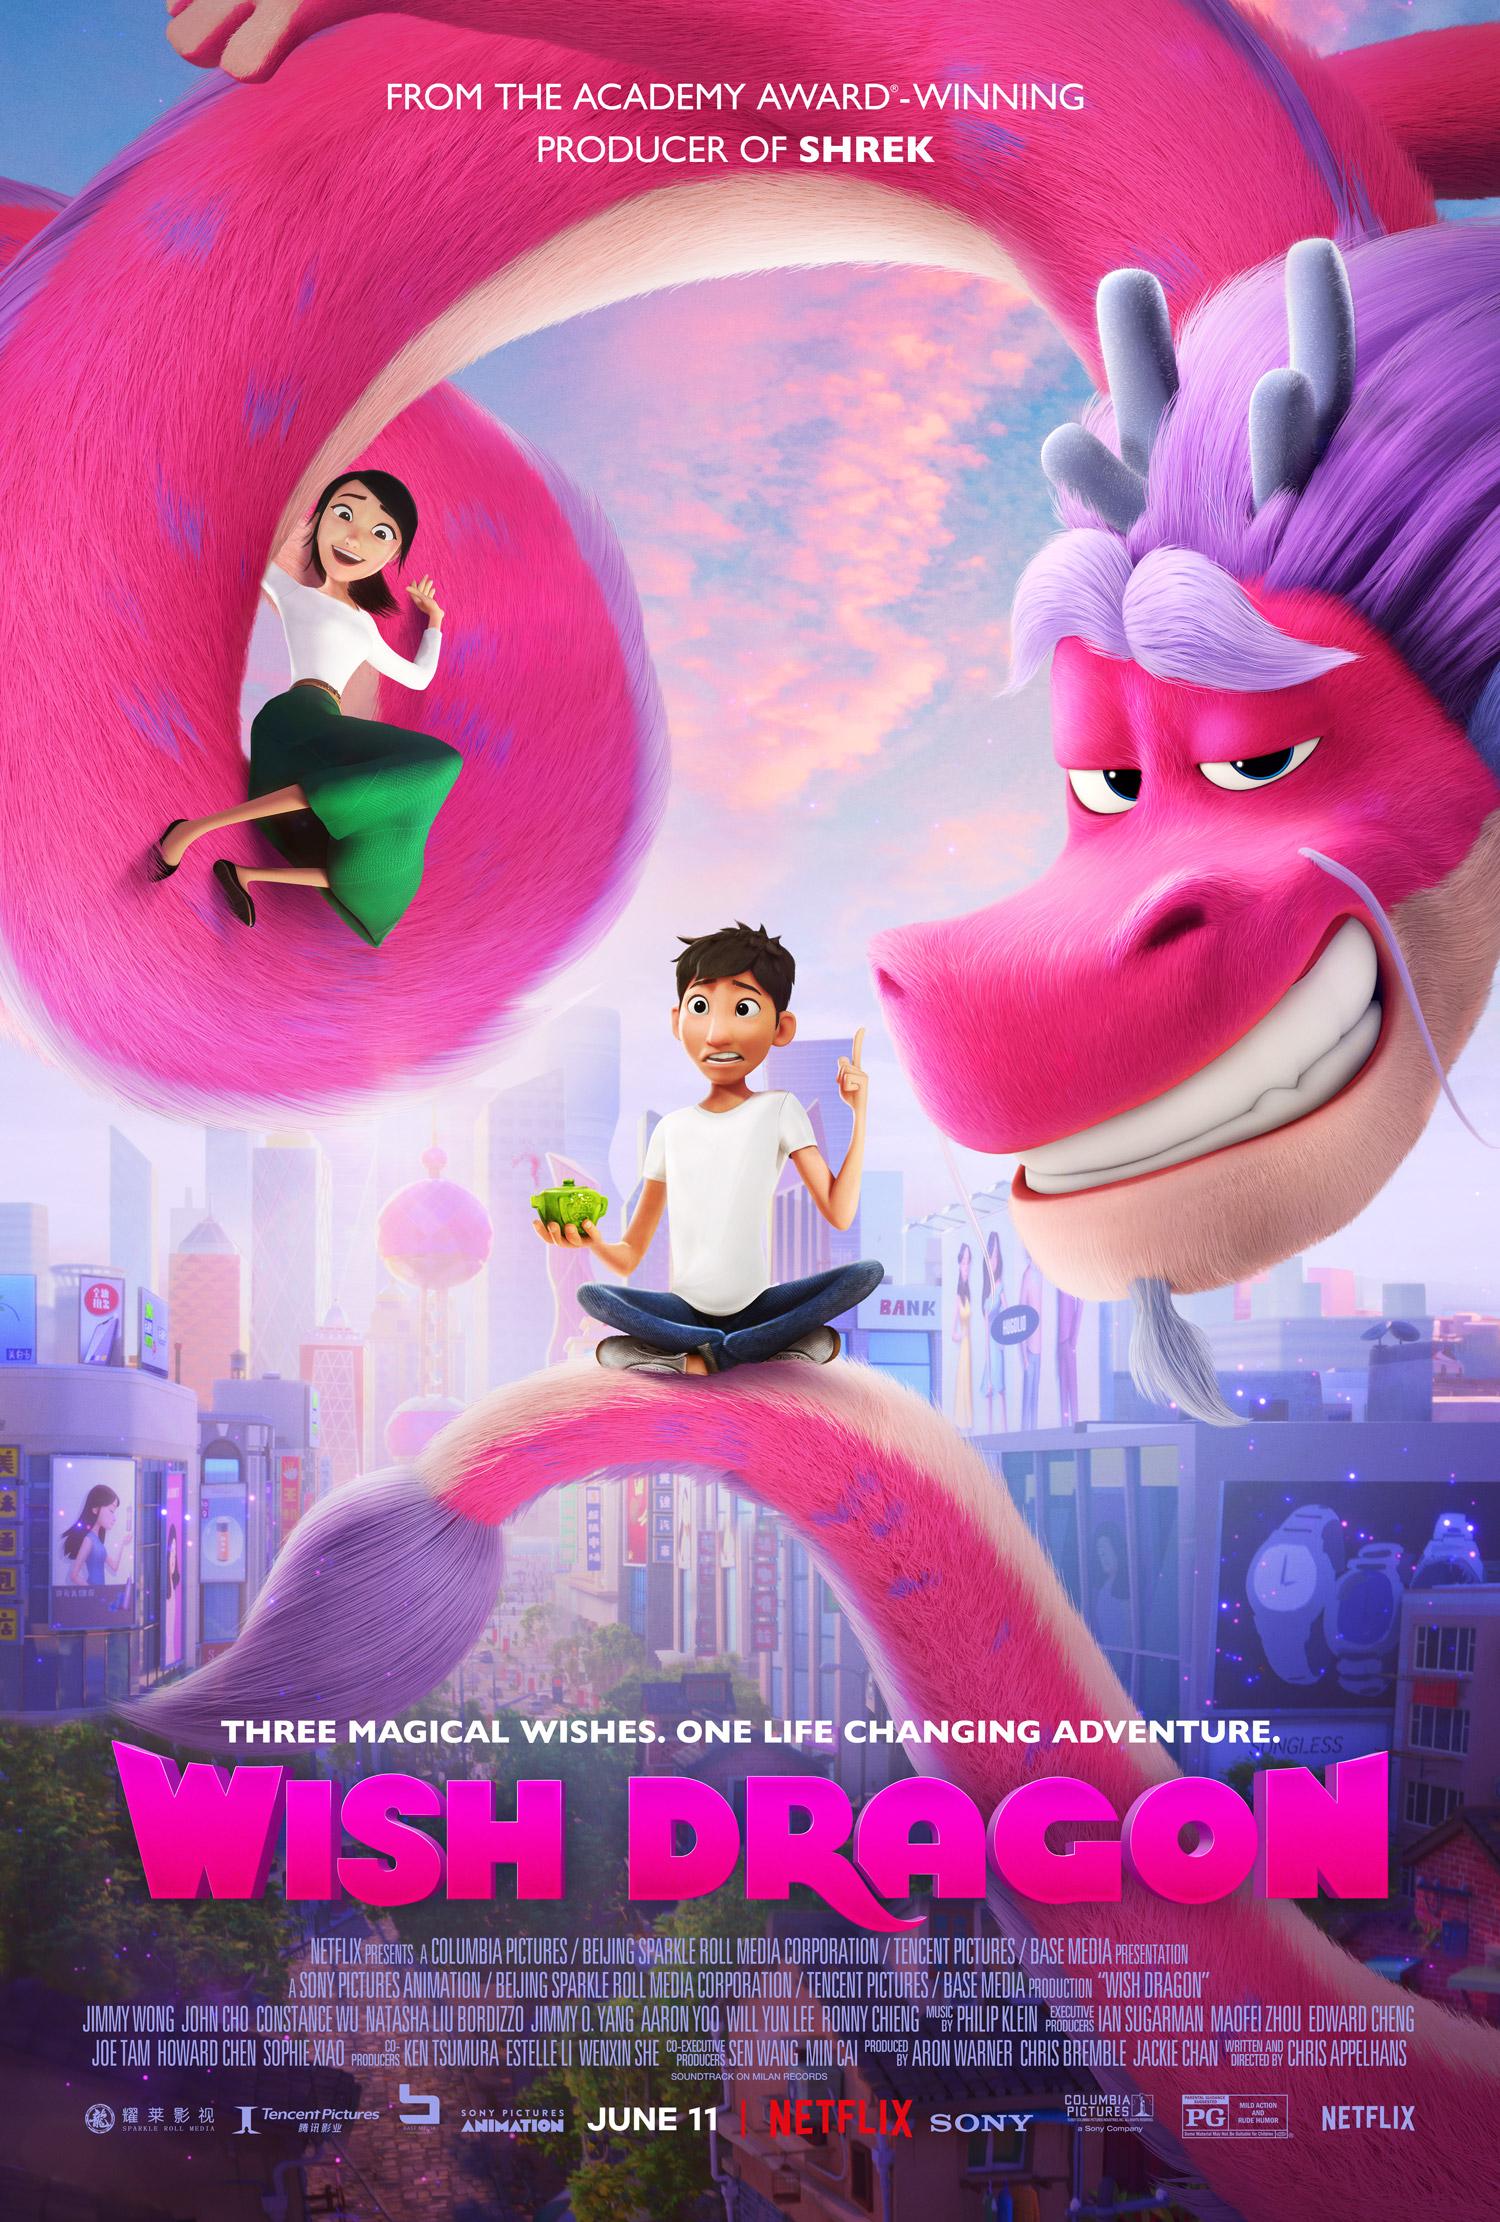 New Movie: Netflix's Wish Dragon Featuring John Cho